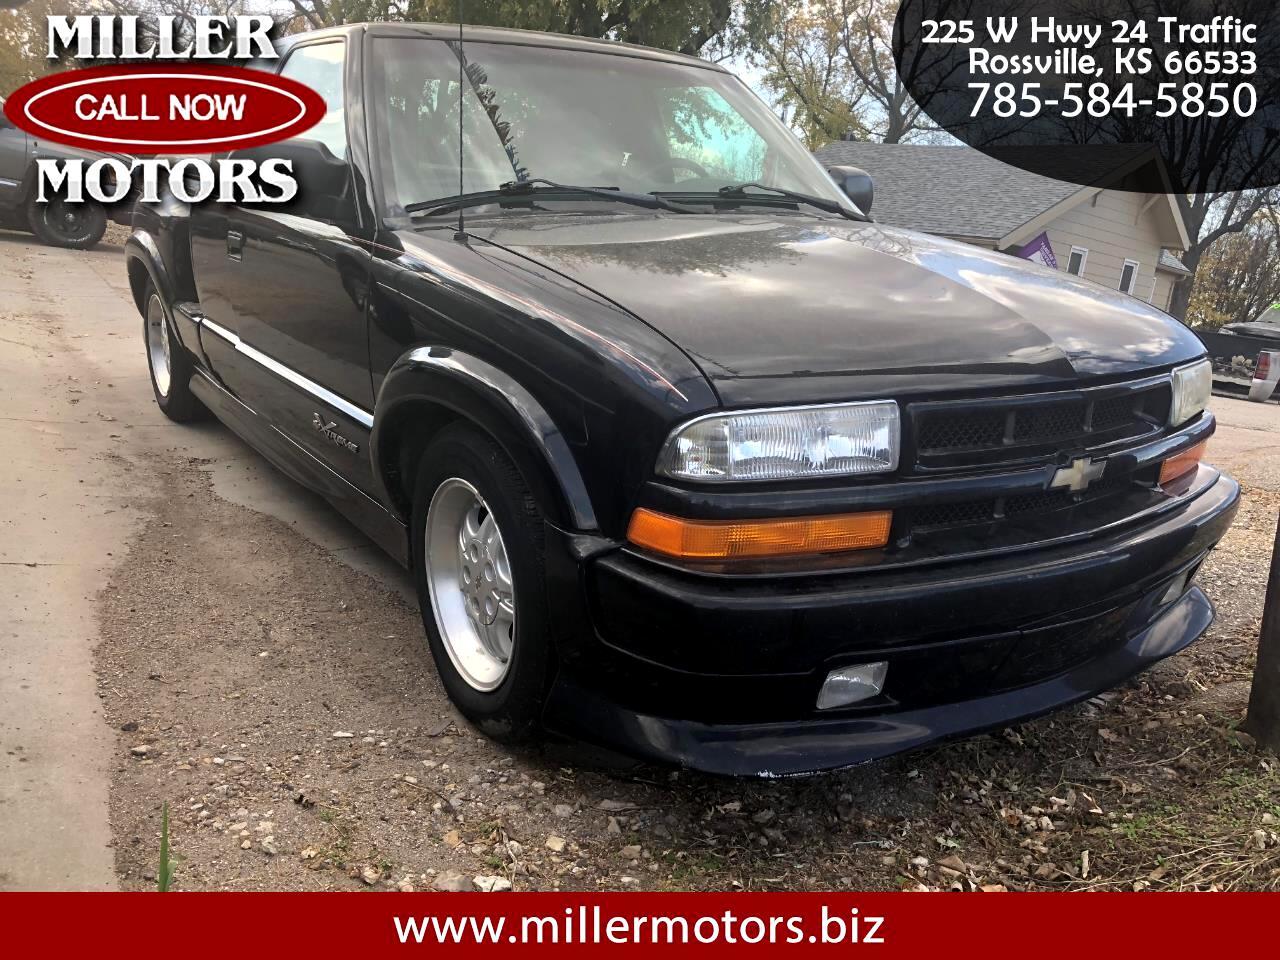 2000 Chevrolet S-10 LS Xtreme